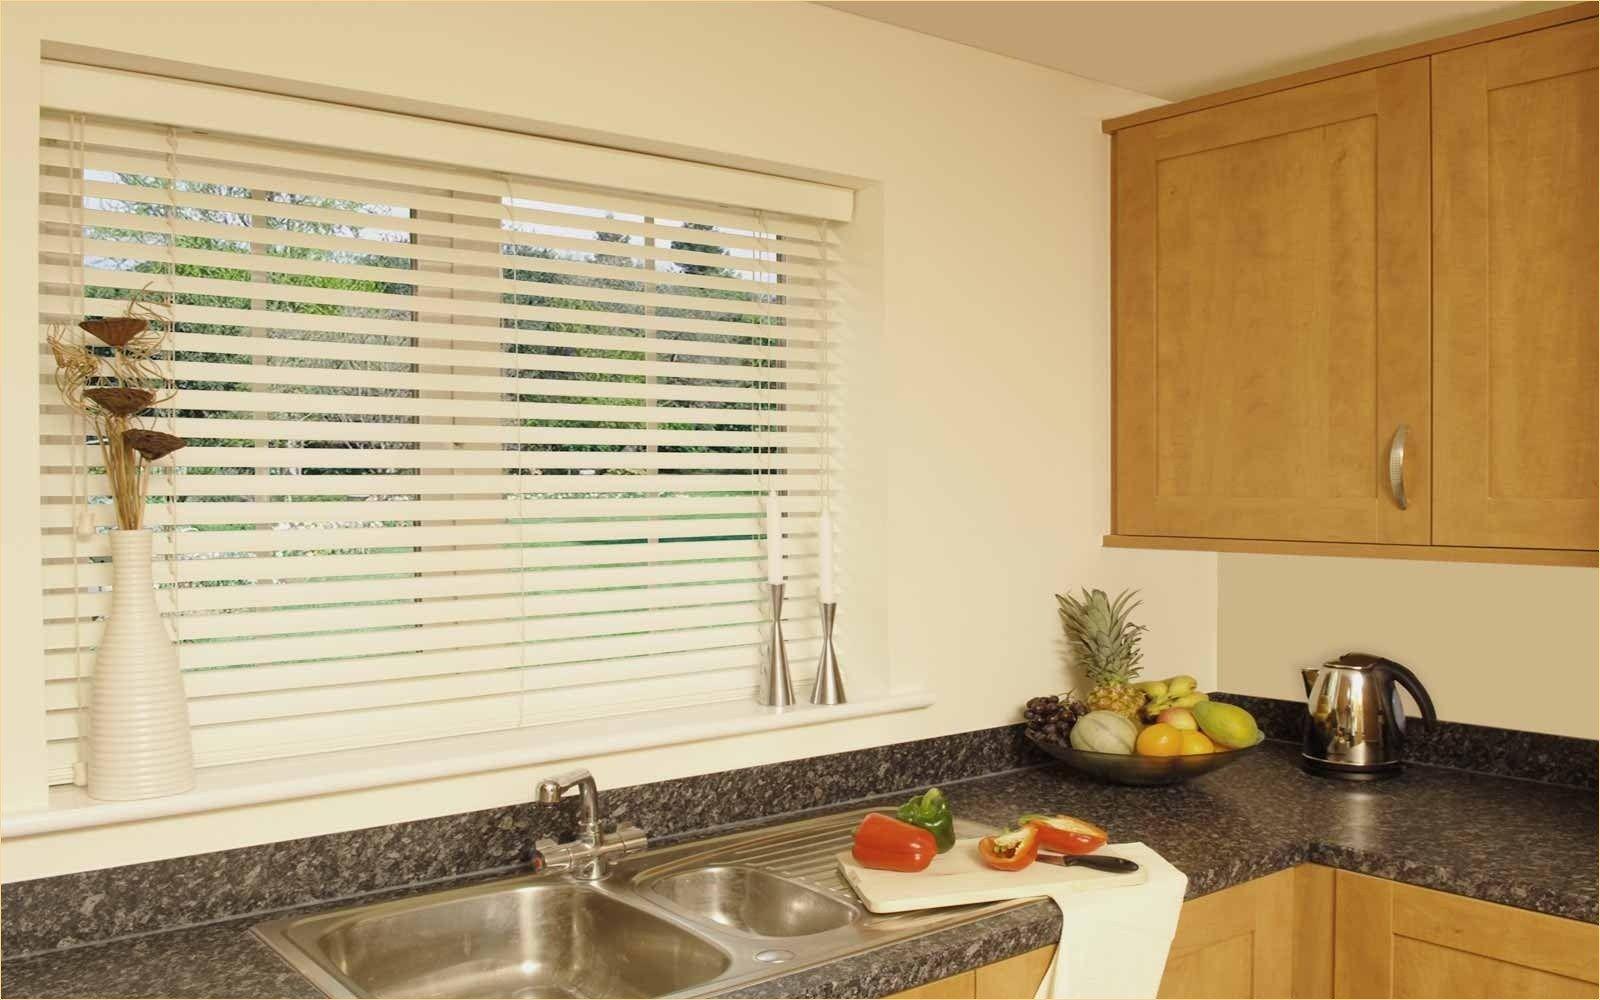 Window coverings shutters   stunning oak kitchen with blinds ideas  kitchen ideas